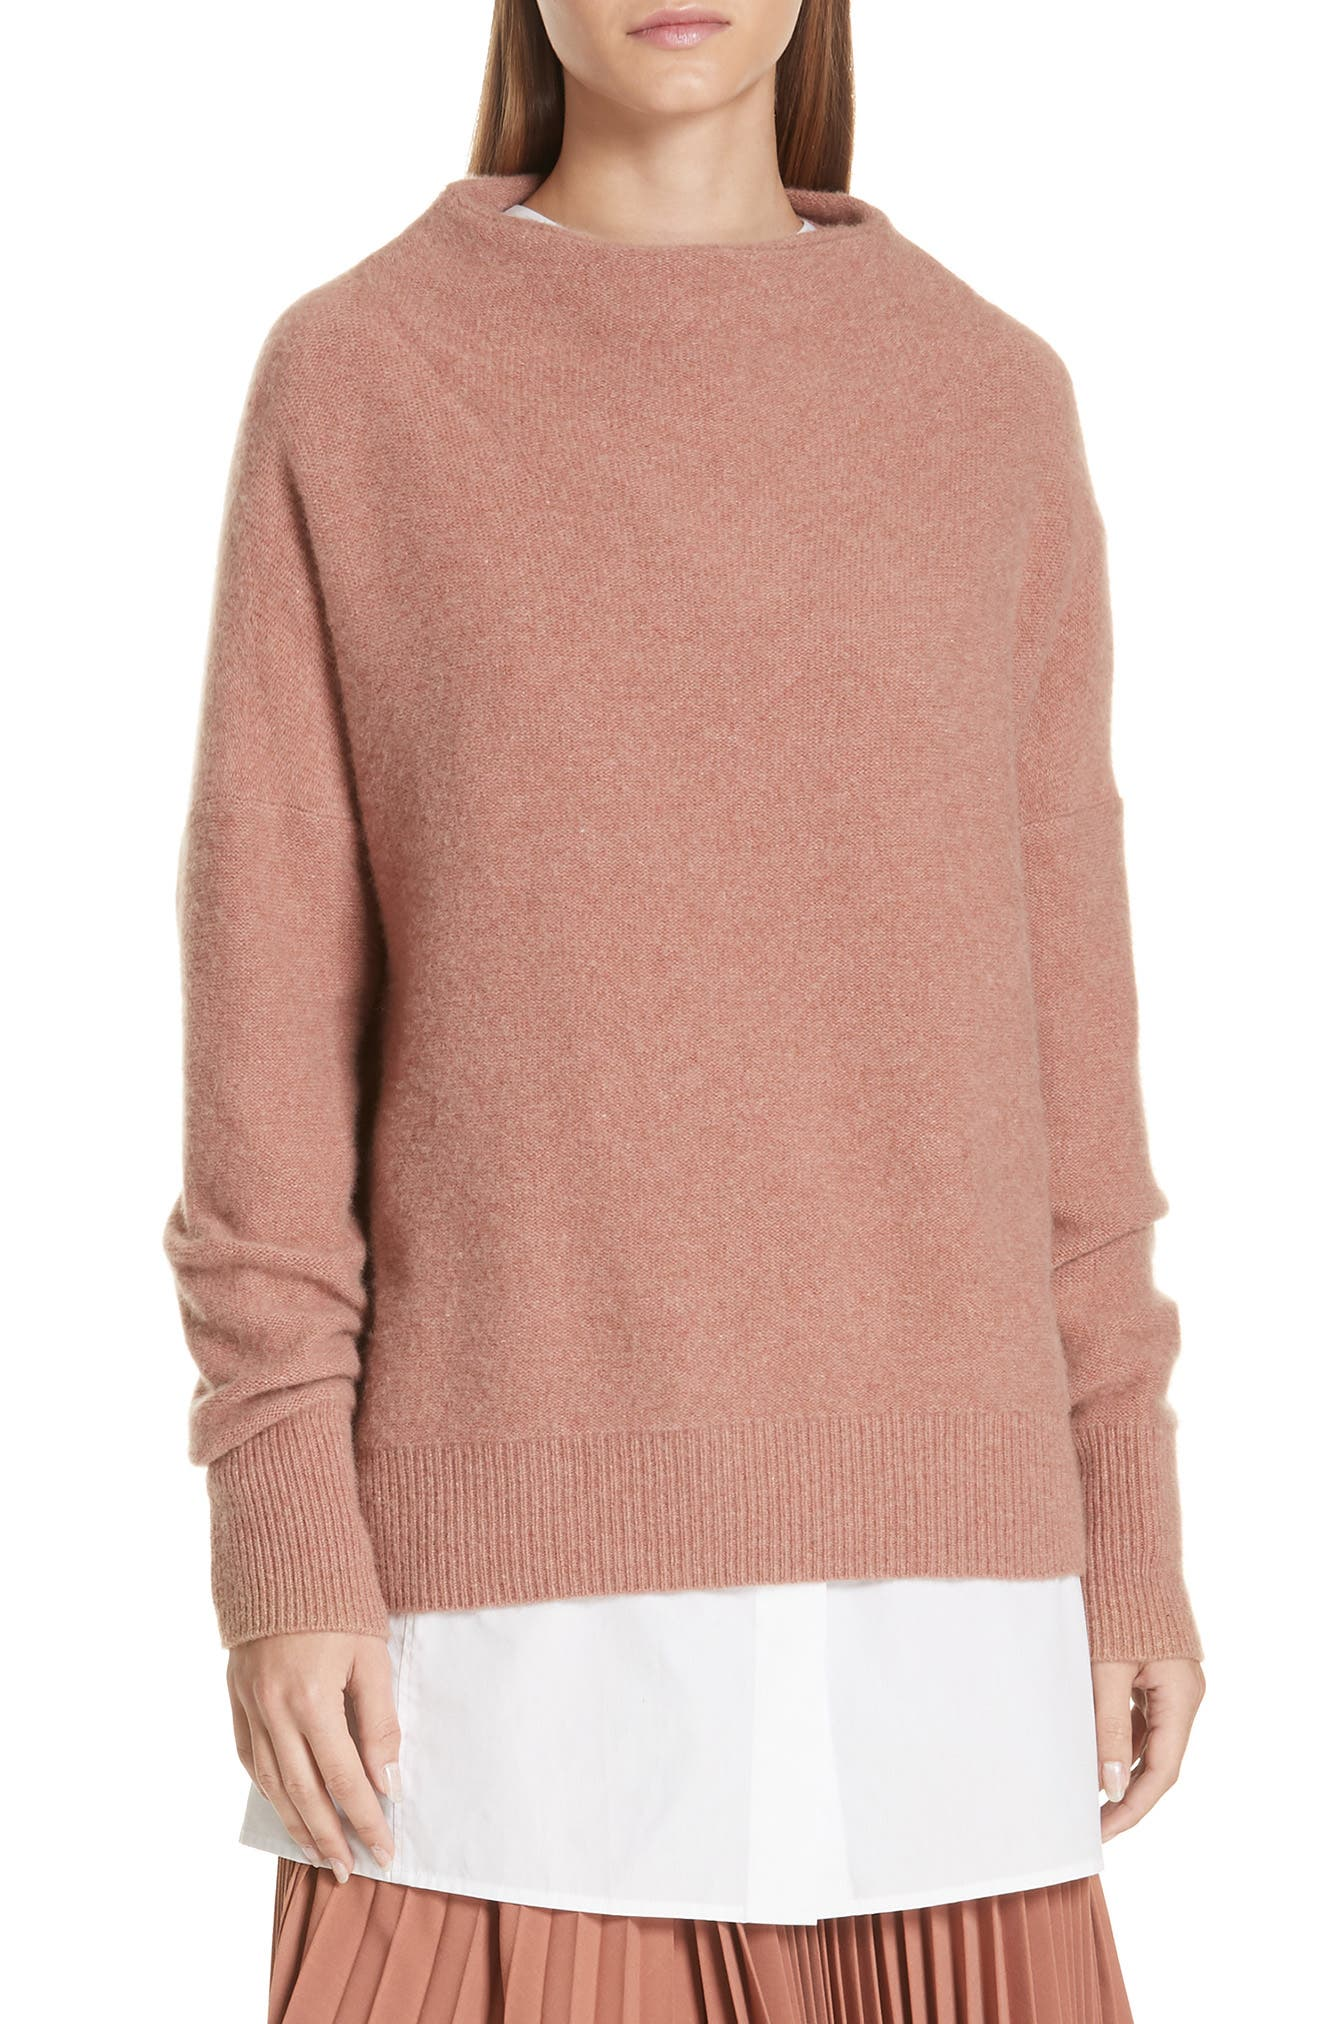 Cashmere Funnel-Neck Pullover Sweater in Coastal